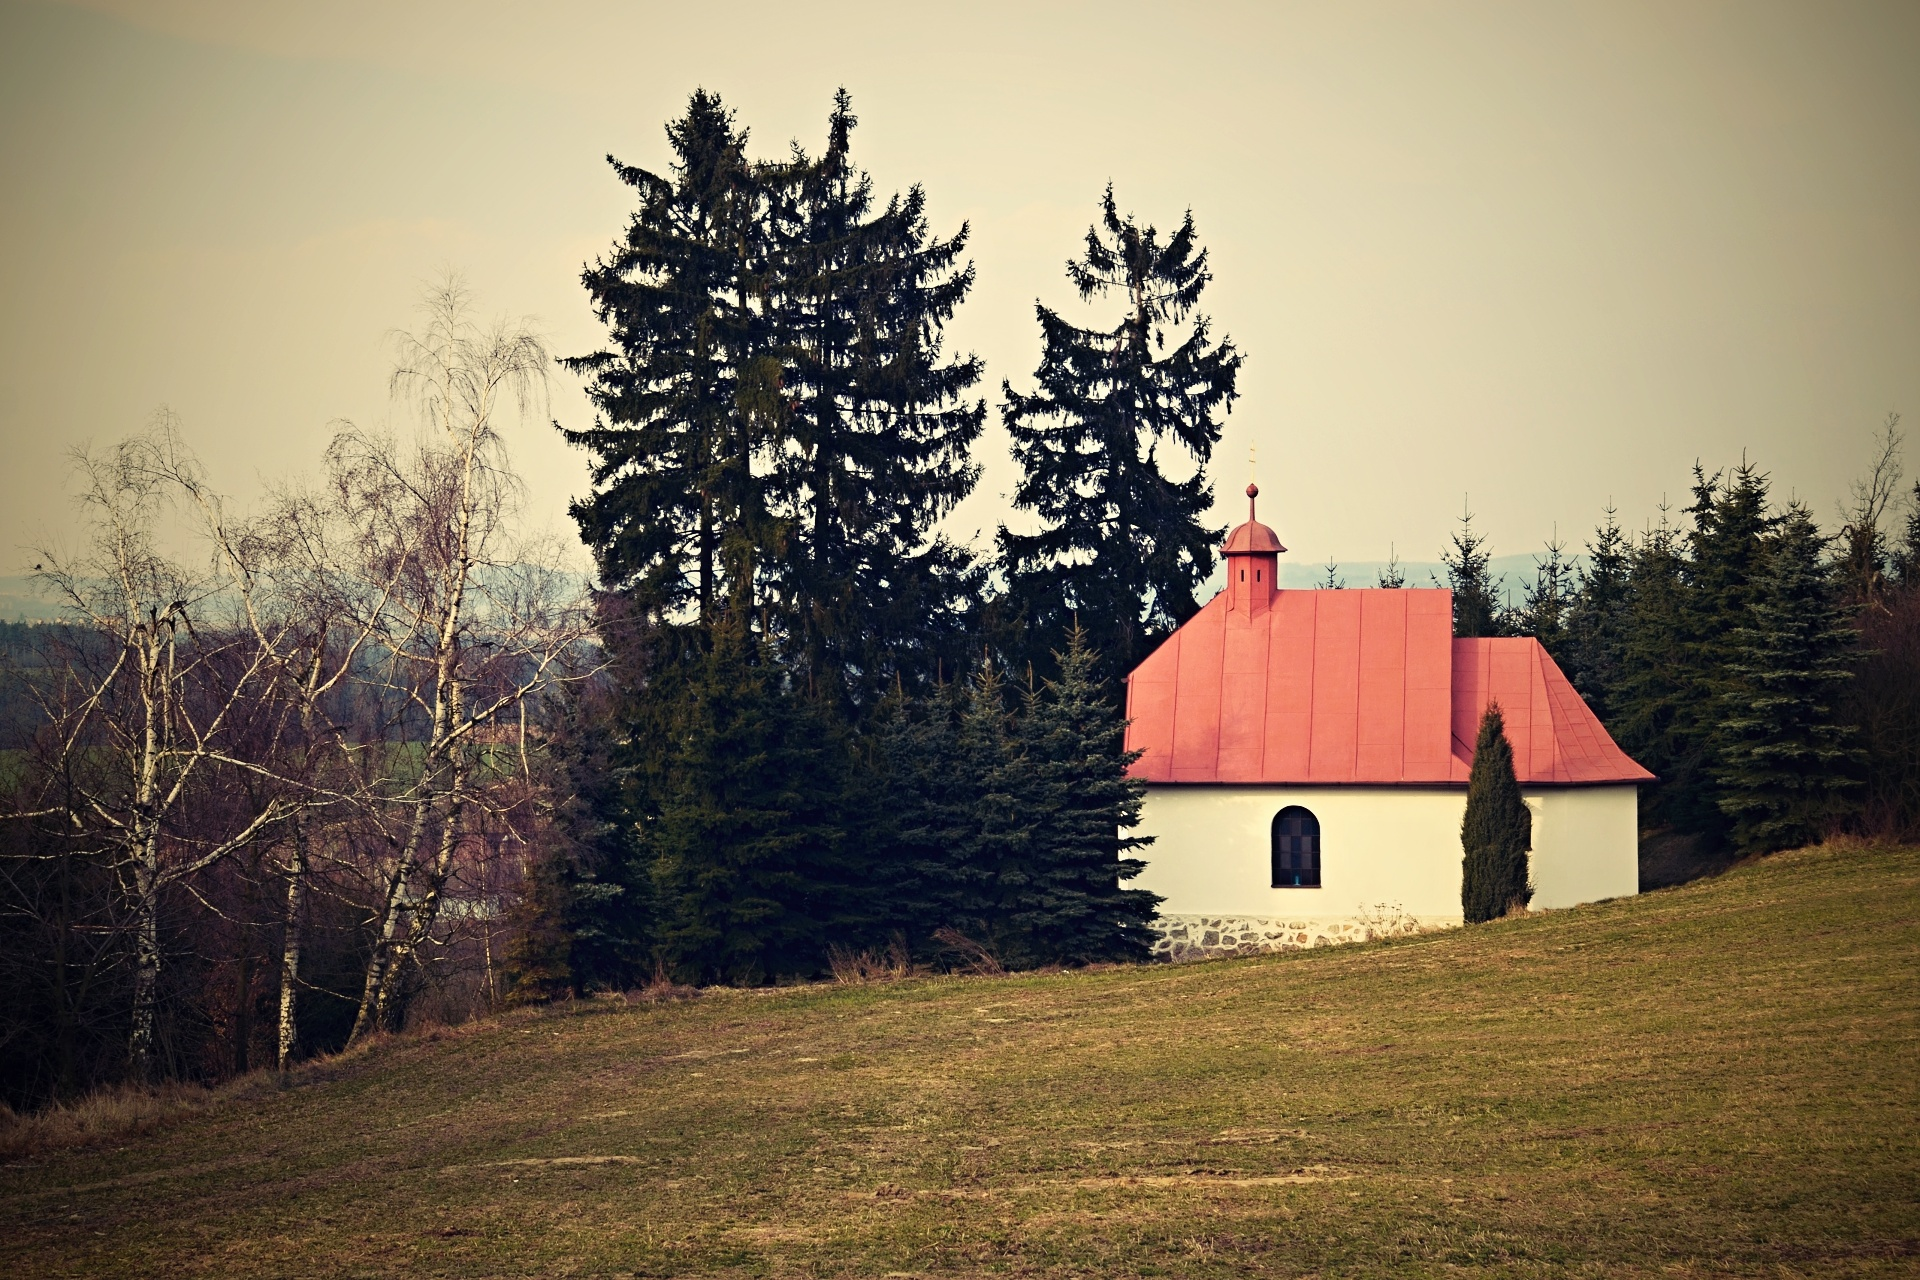 Kaple Sv. Marie, Pyšel